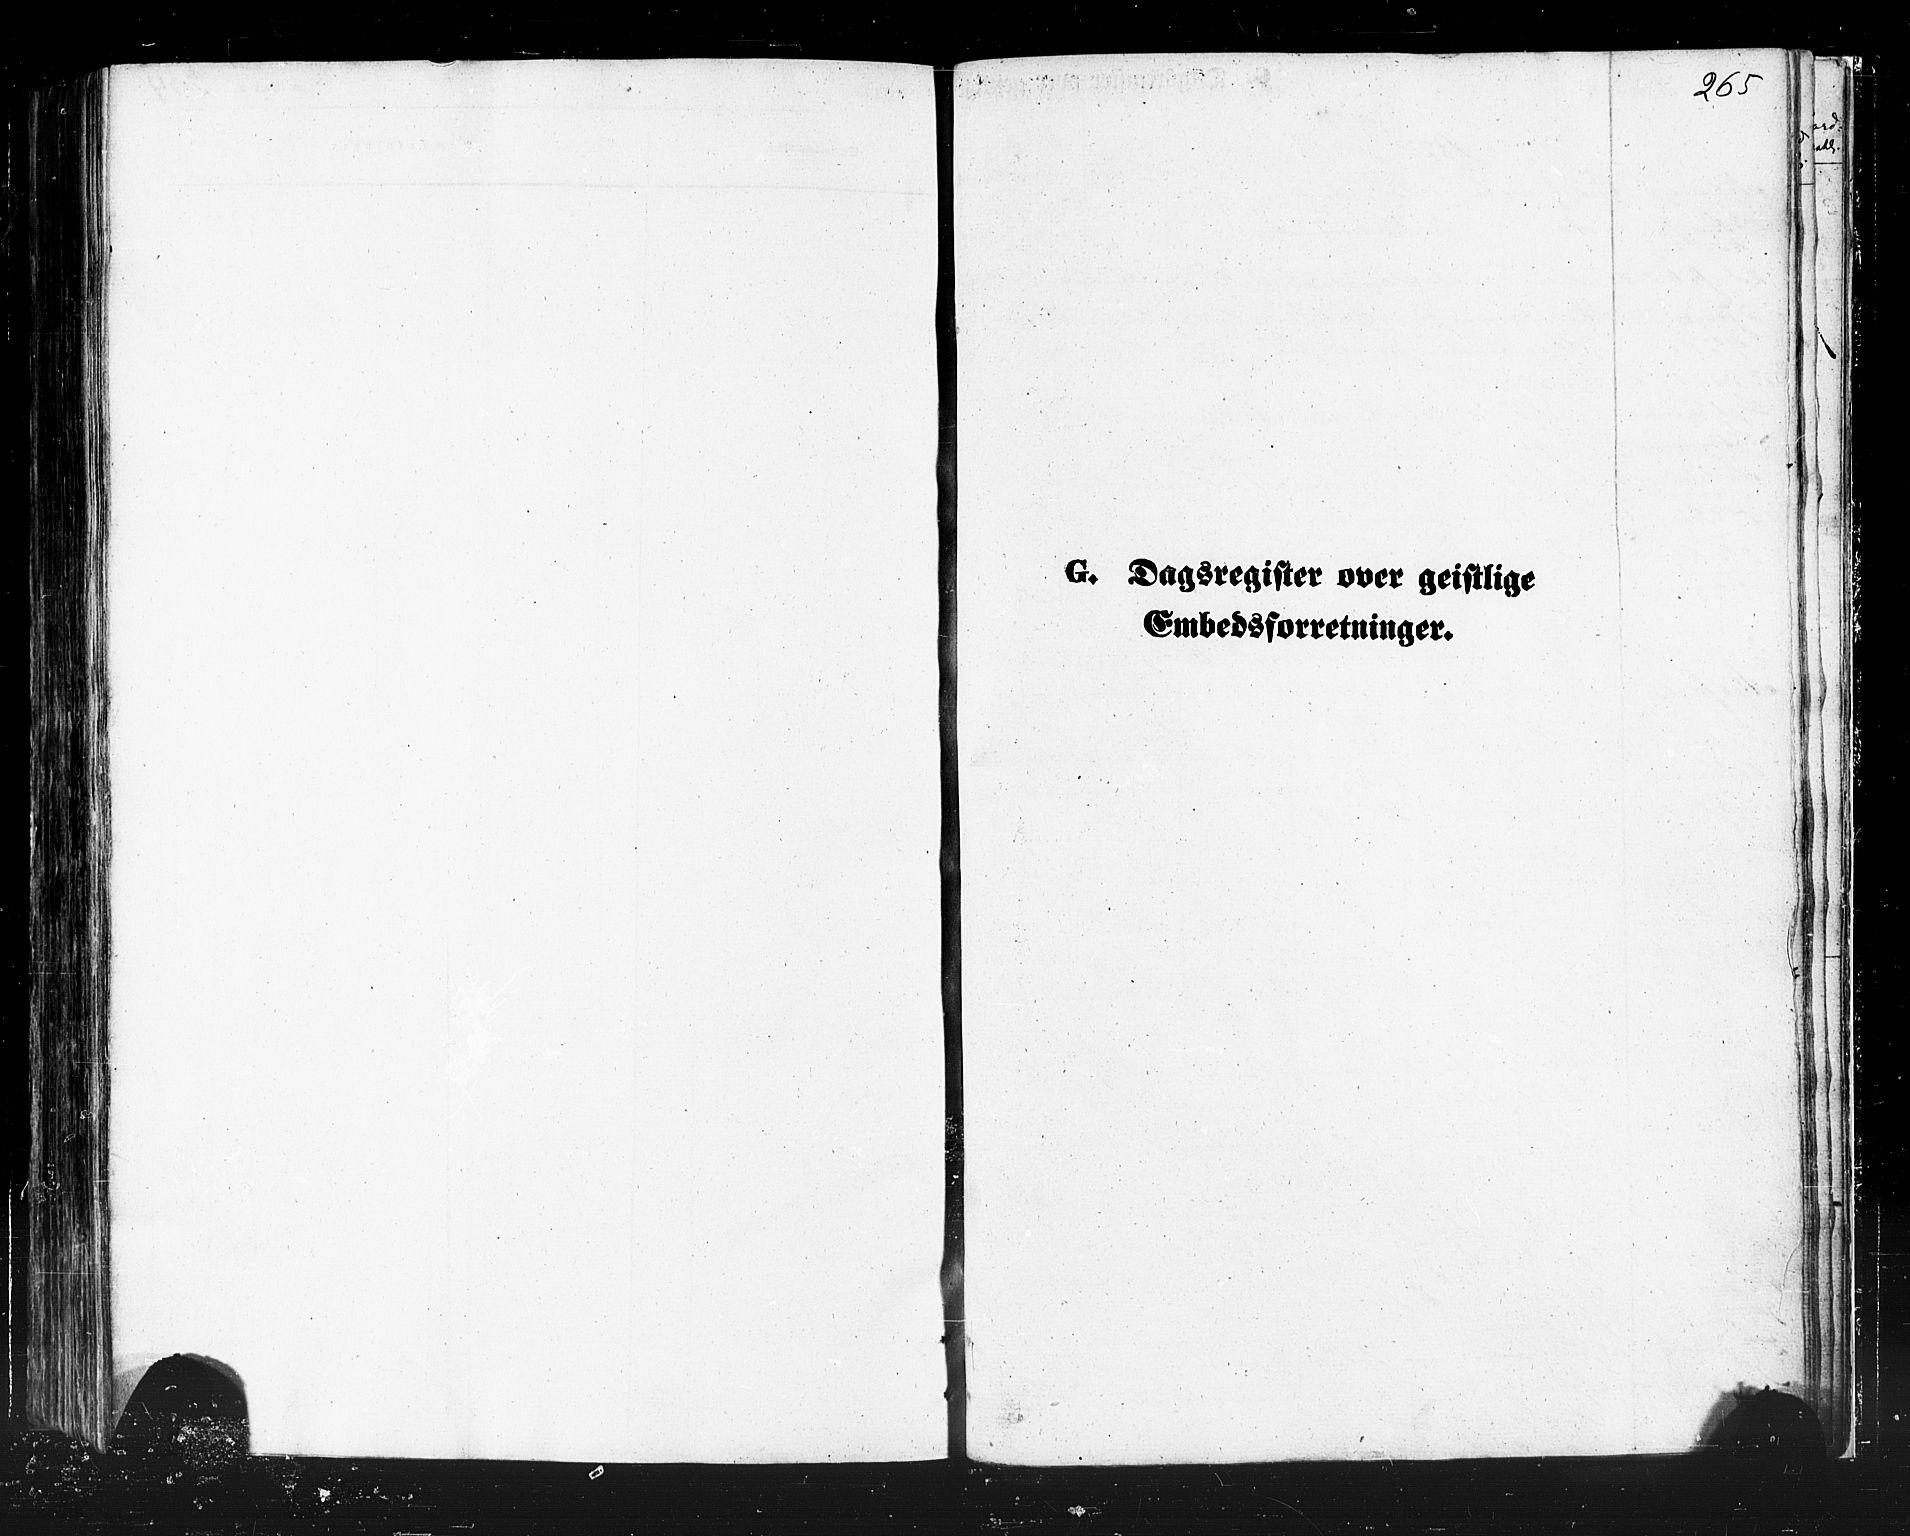 SATØ, Karasjok sokneprestkontor, H/Ha/L0001kirke: Ministerialbok nr. 1, 1872-1884, s. 265